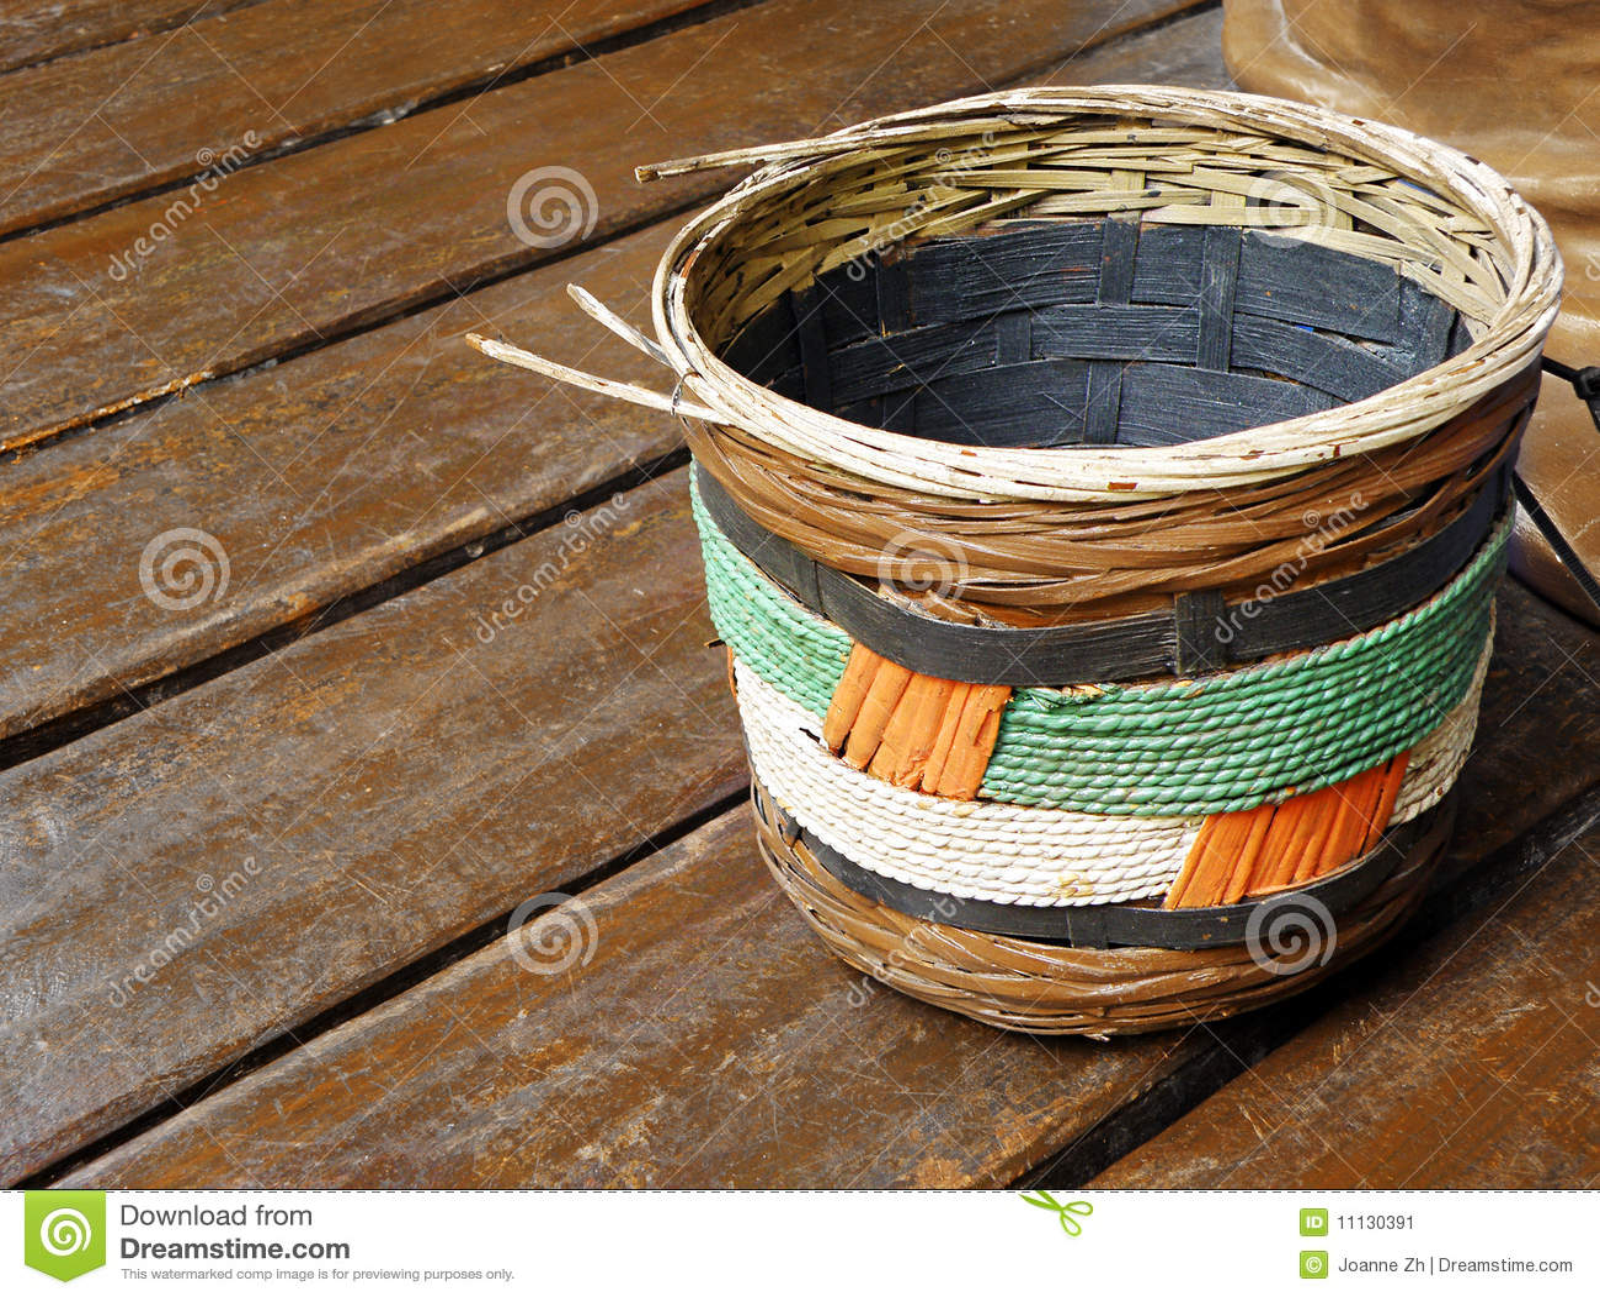 Ethnic Baskets 75